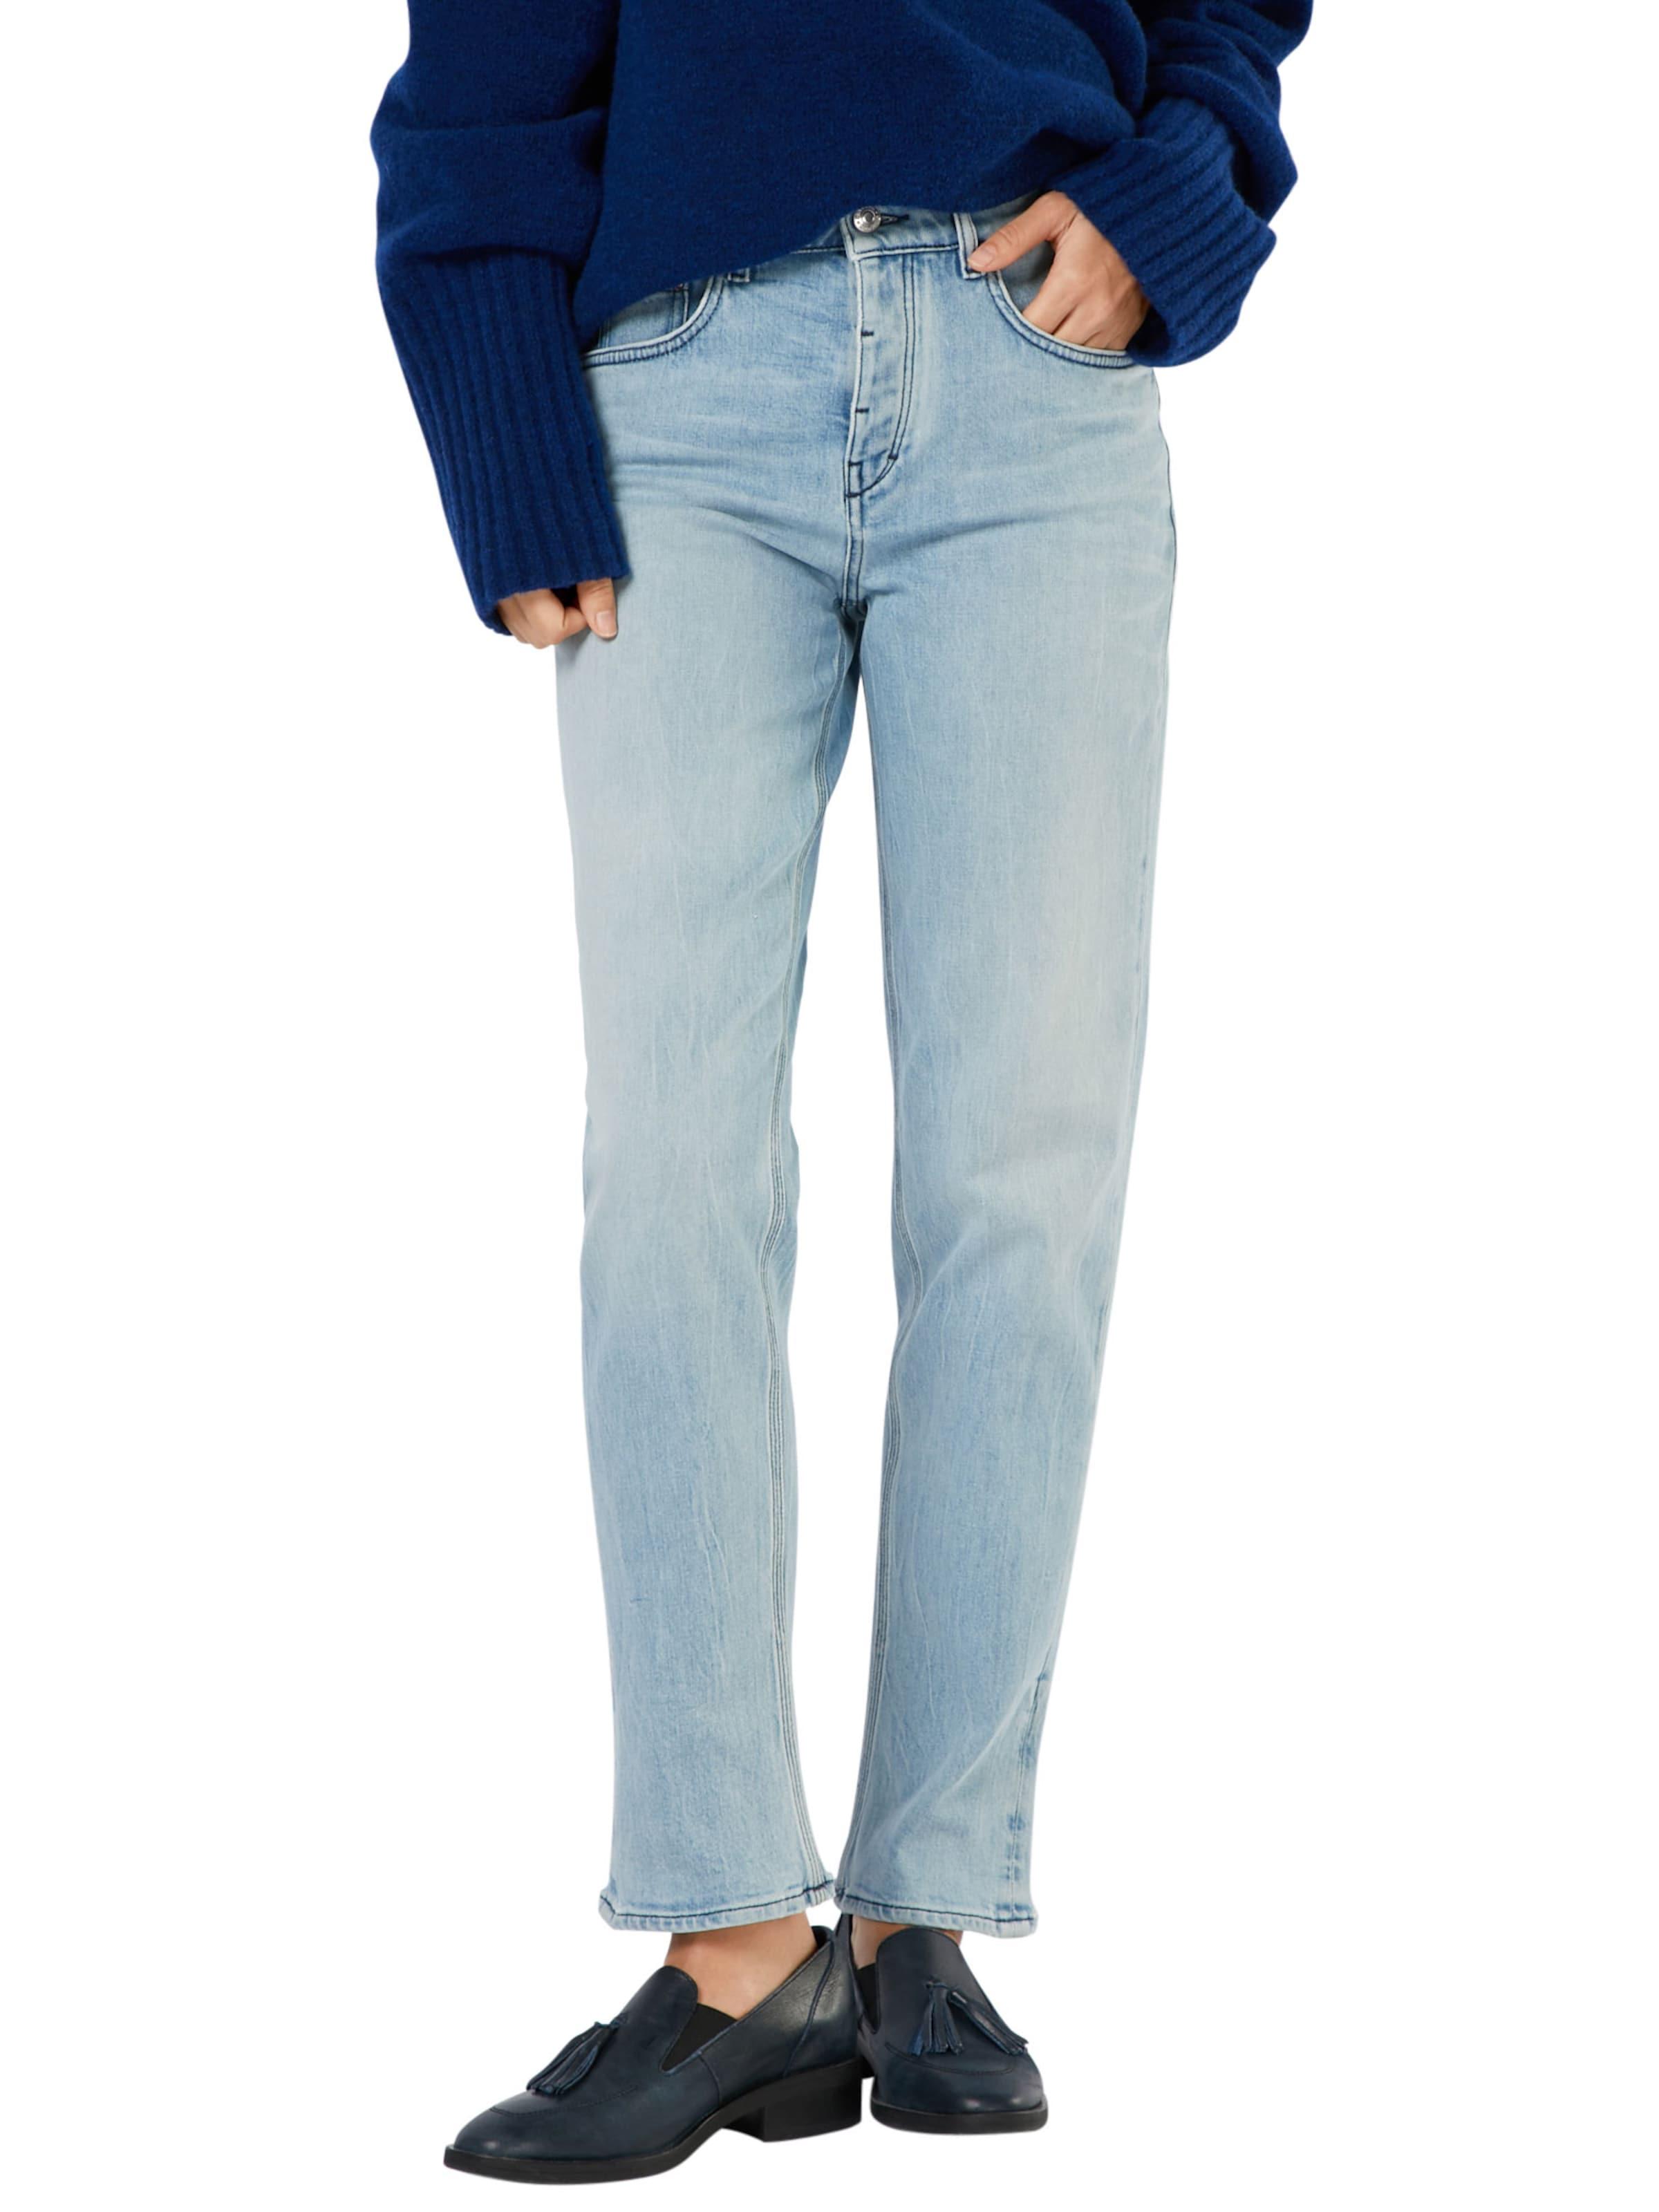 DRYKORN Regular Jeans 'FREE' Geringster Preis AkZqN